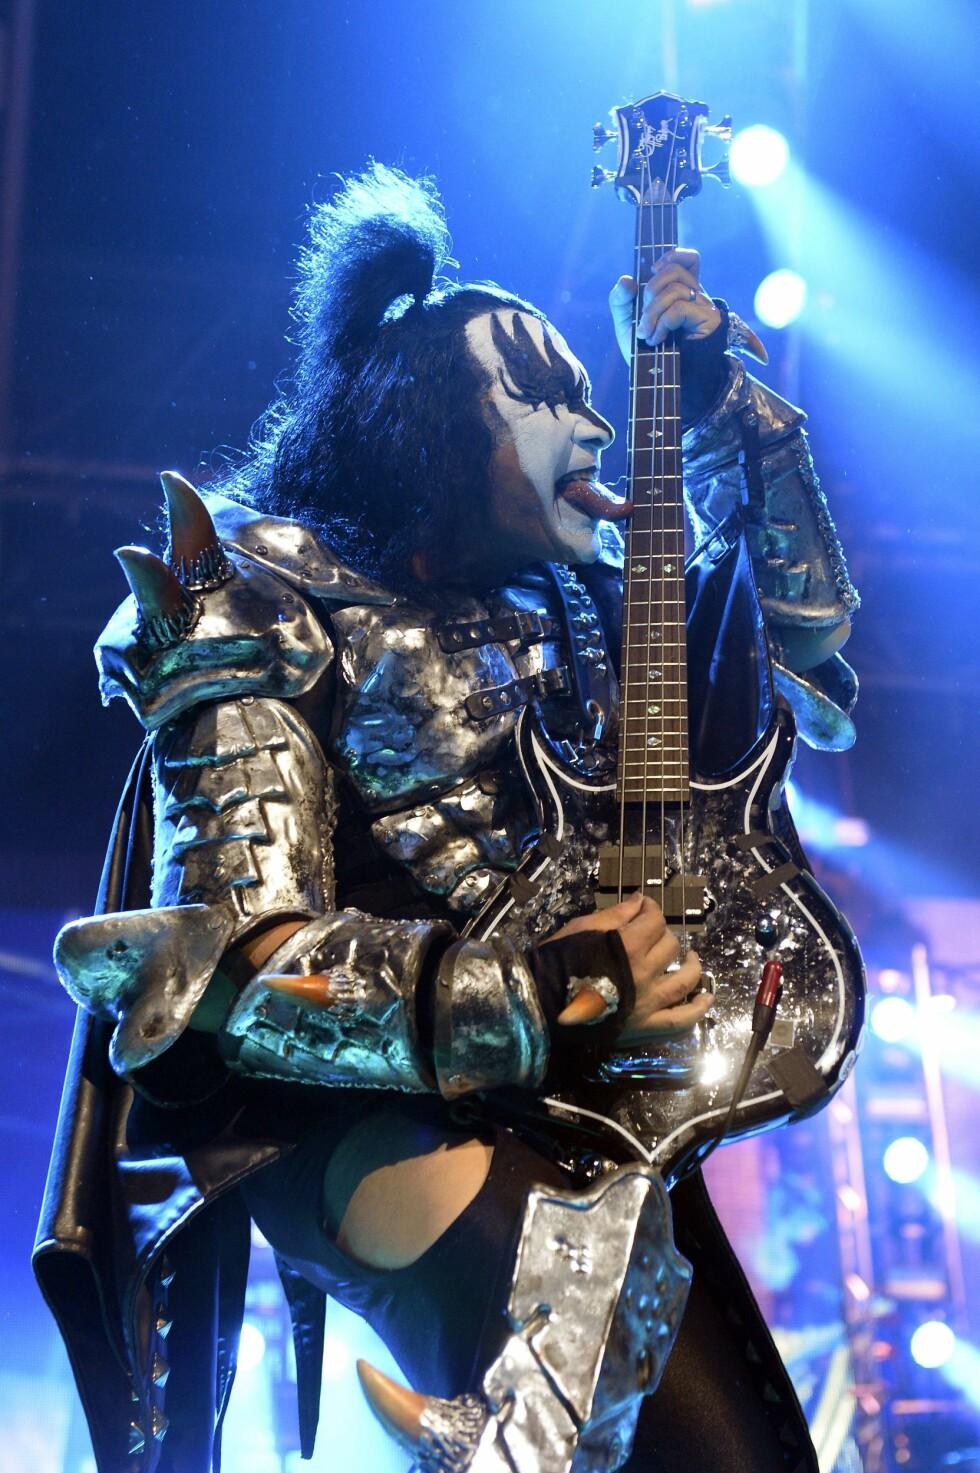 DIGGER ANGELINA: Gene Simmons, vokalist og bassist i rockebandet Kiss, er en av stjernene som har trykket Angelina Jordan til sitt bryst. Her er han på scenen i Paris i juni 2015.  Foto: Afp